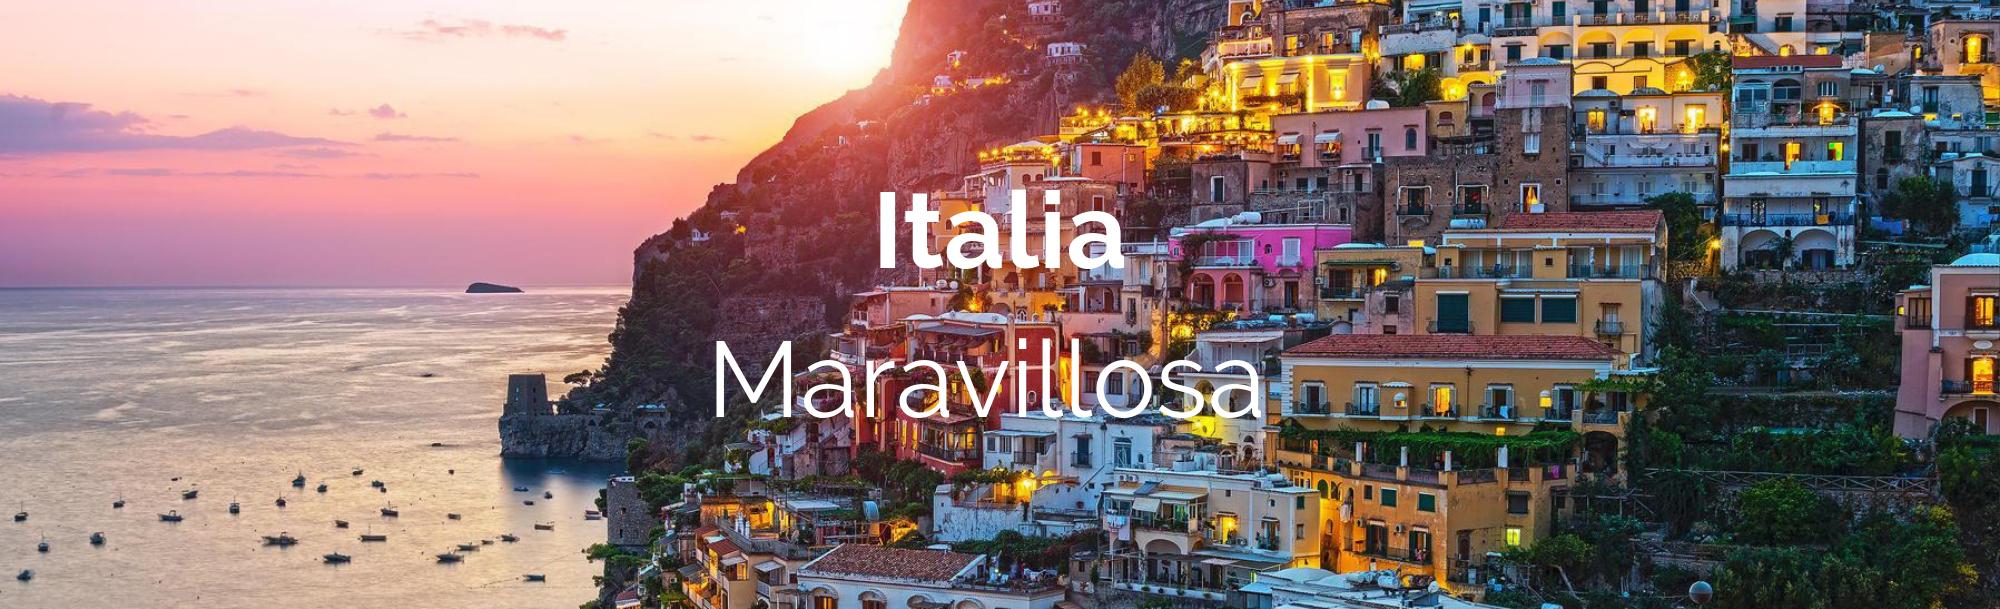 Italia Maravillosa